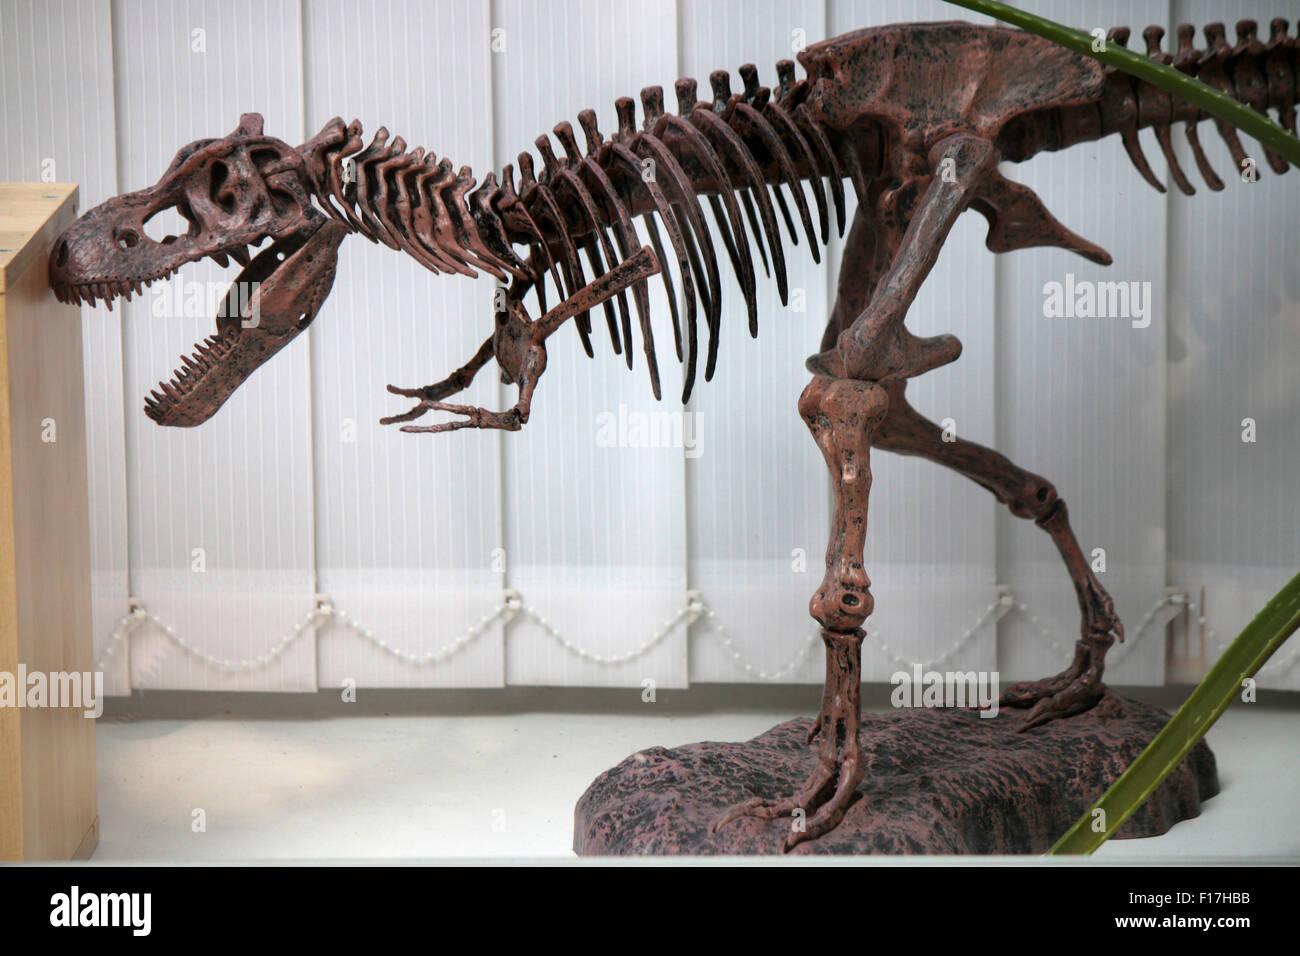 Modell eines Dinosaurier-Skeletts, Berlin. - Stock Image